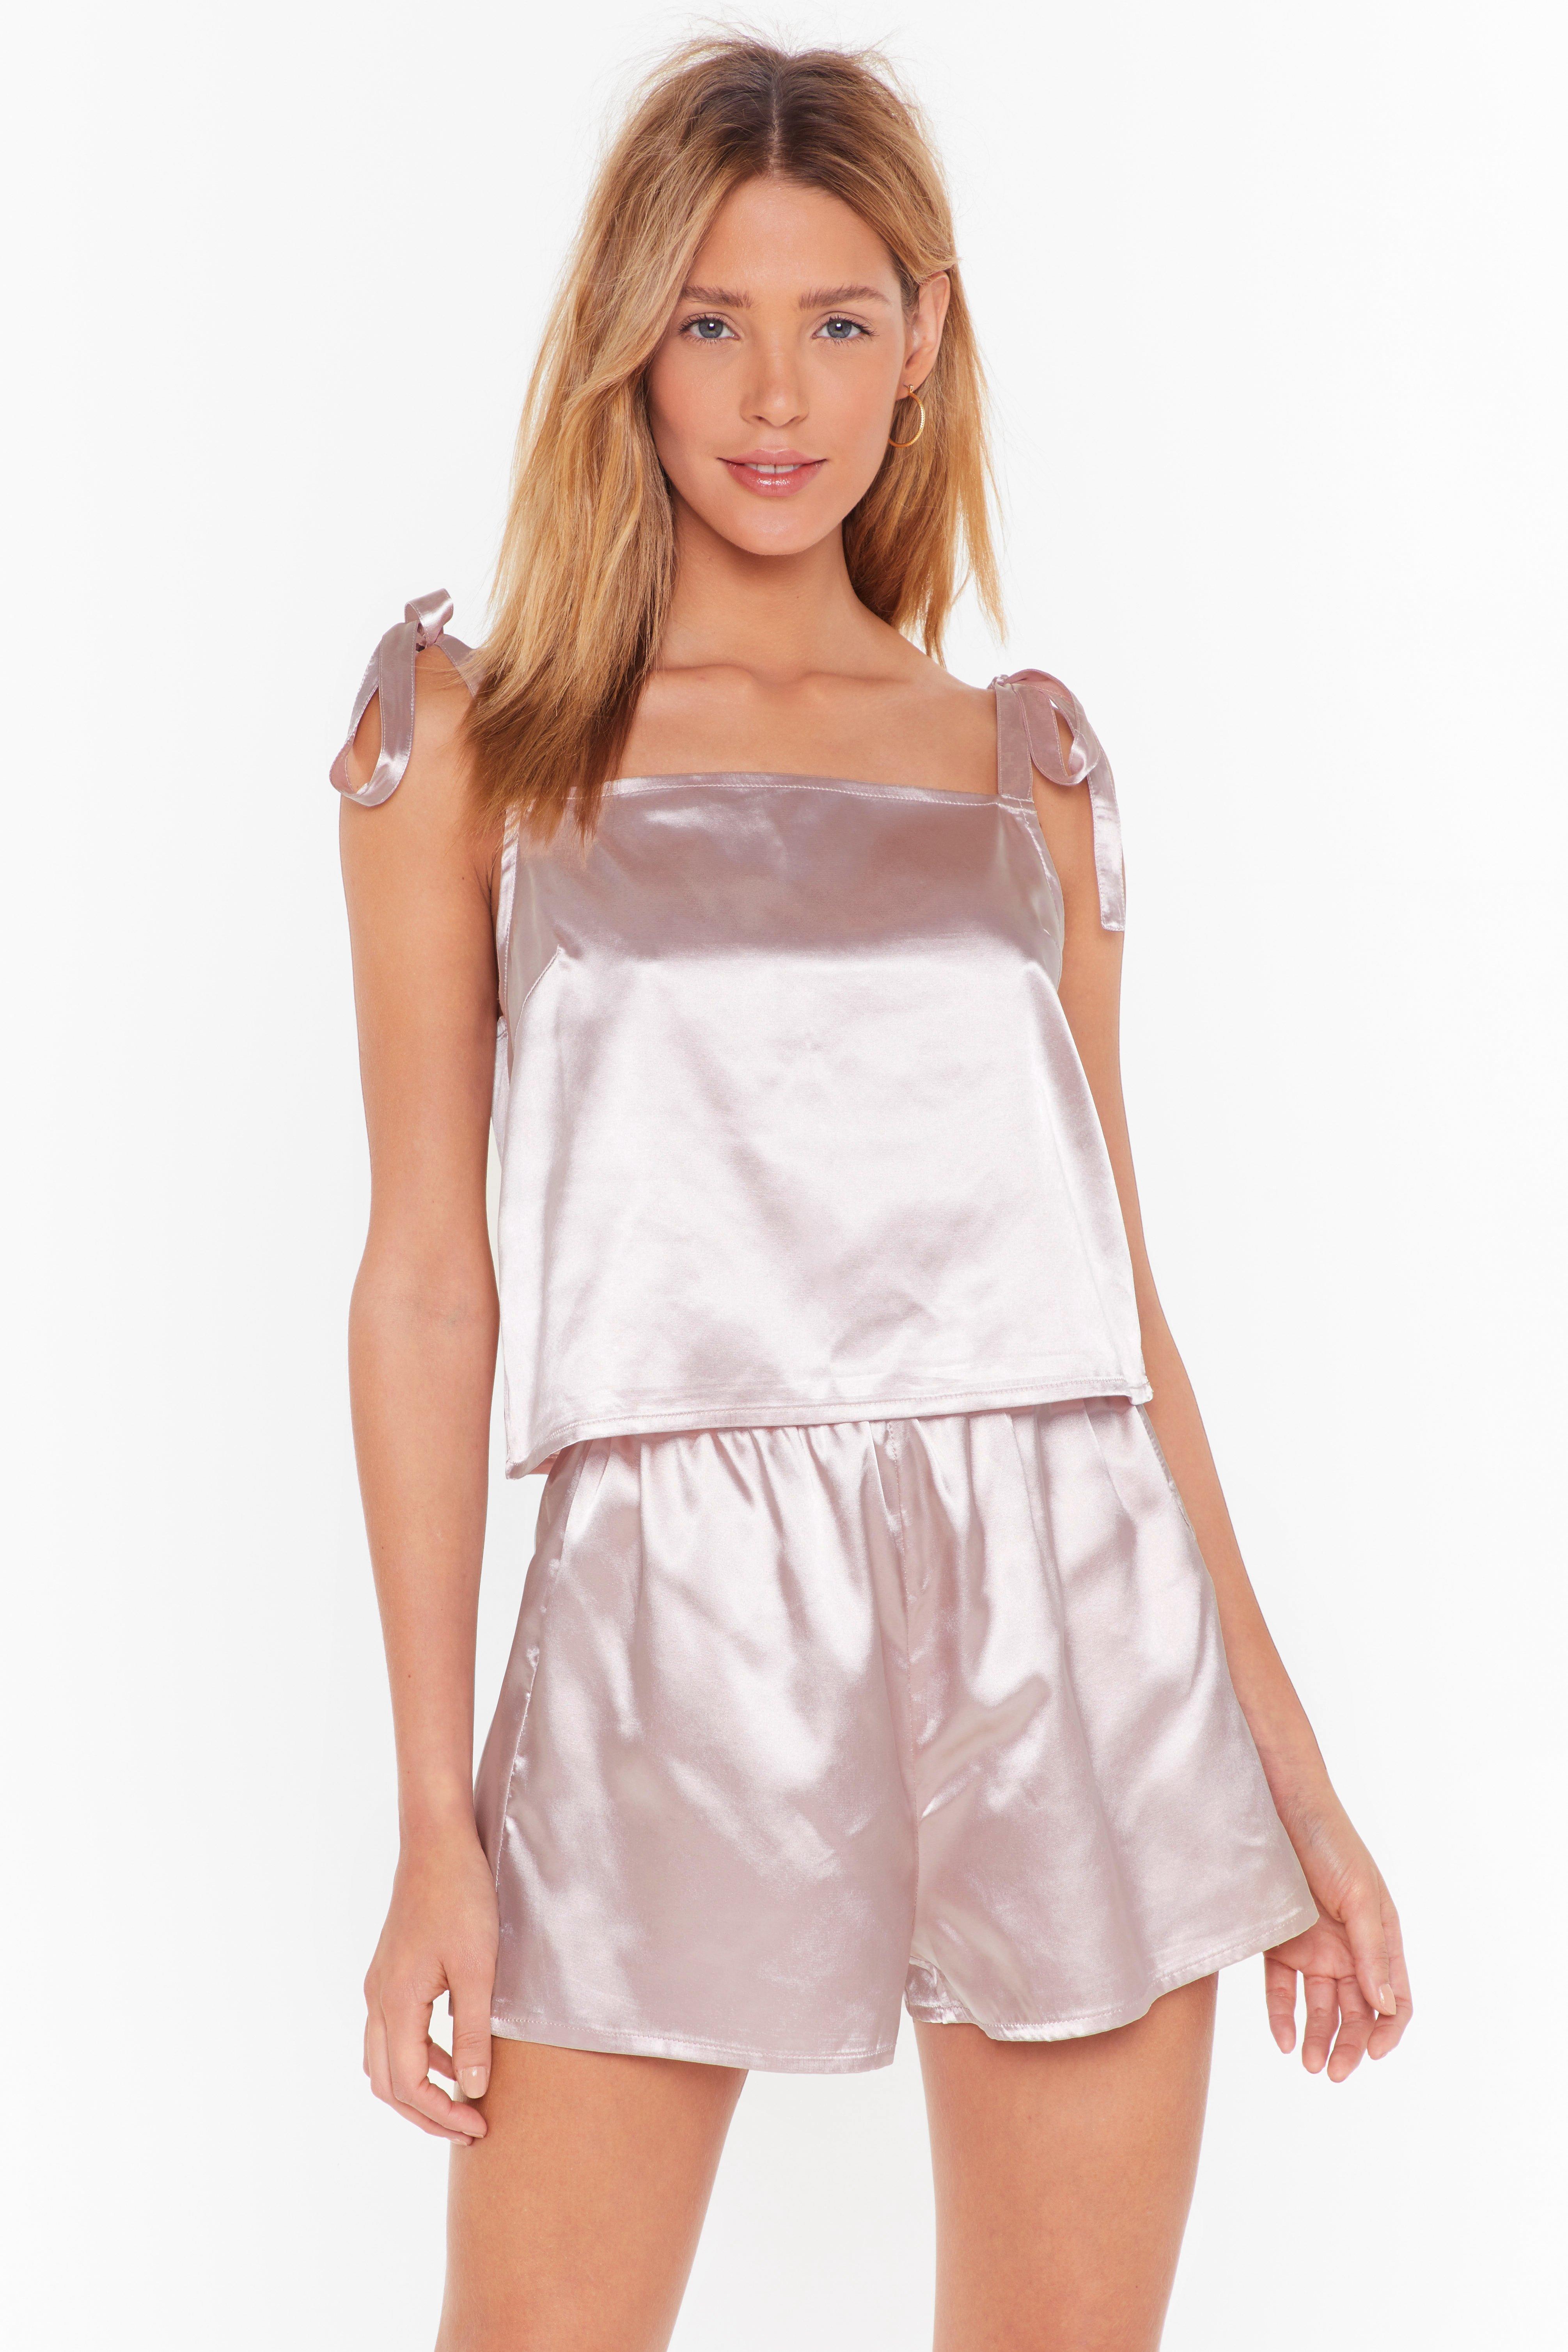 Image of Sleek Dreams Satin Pajama Shorts Set